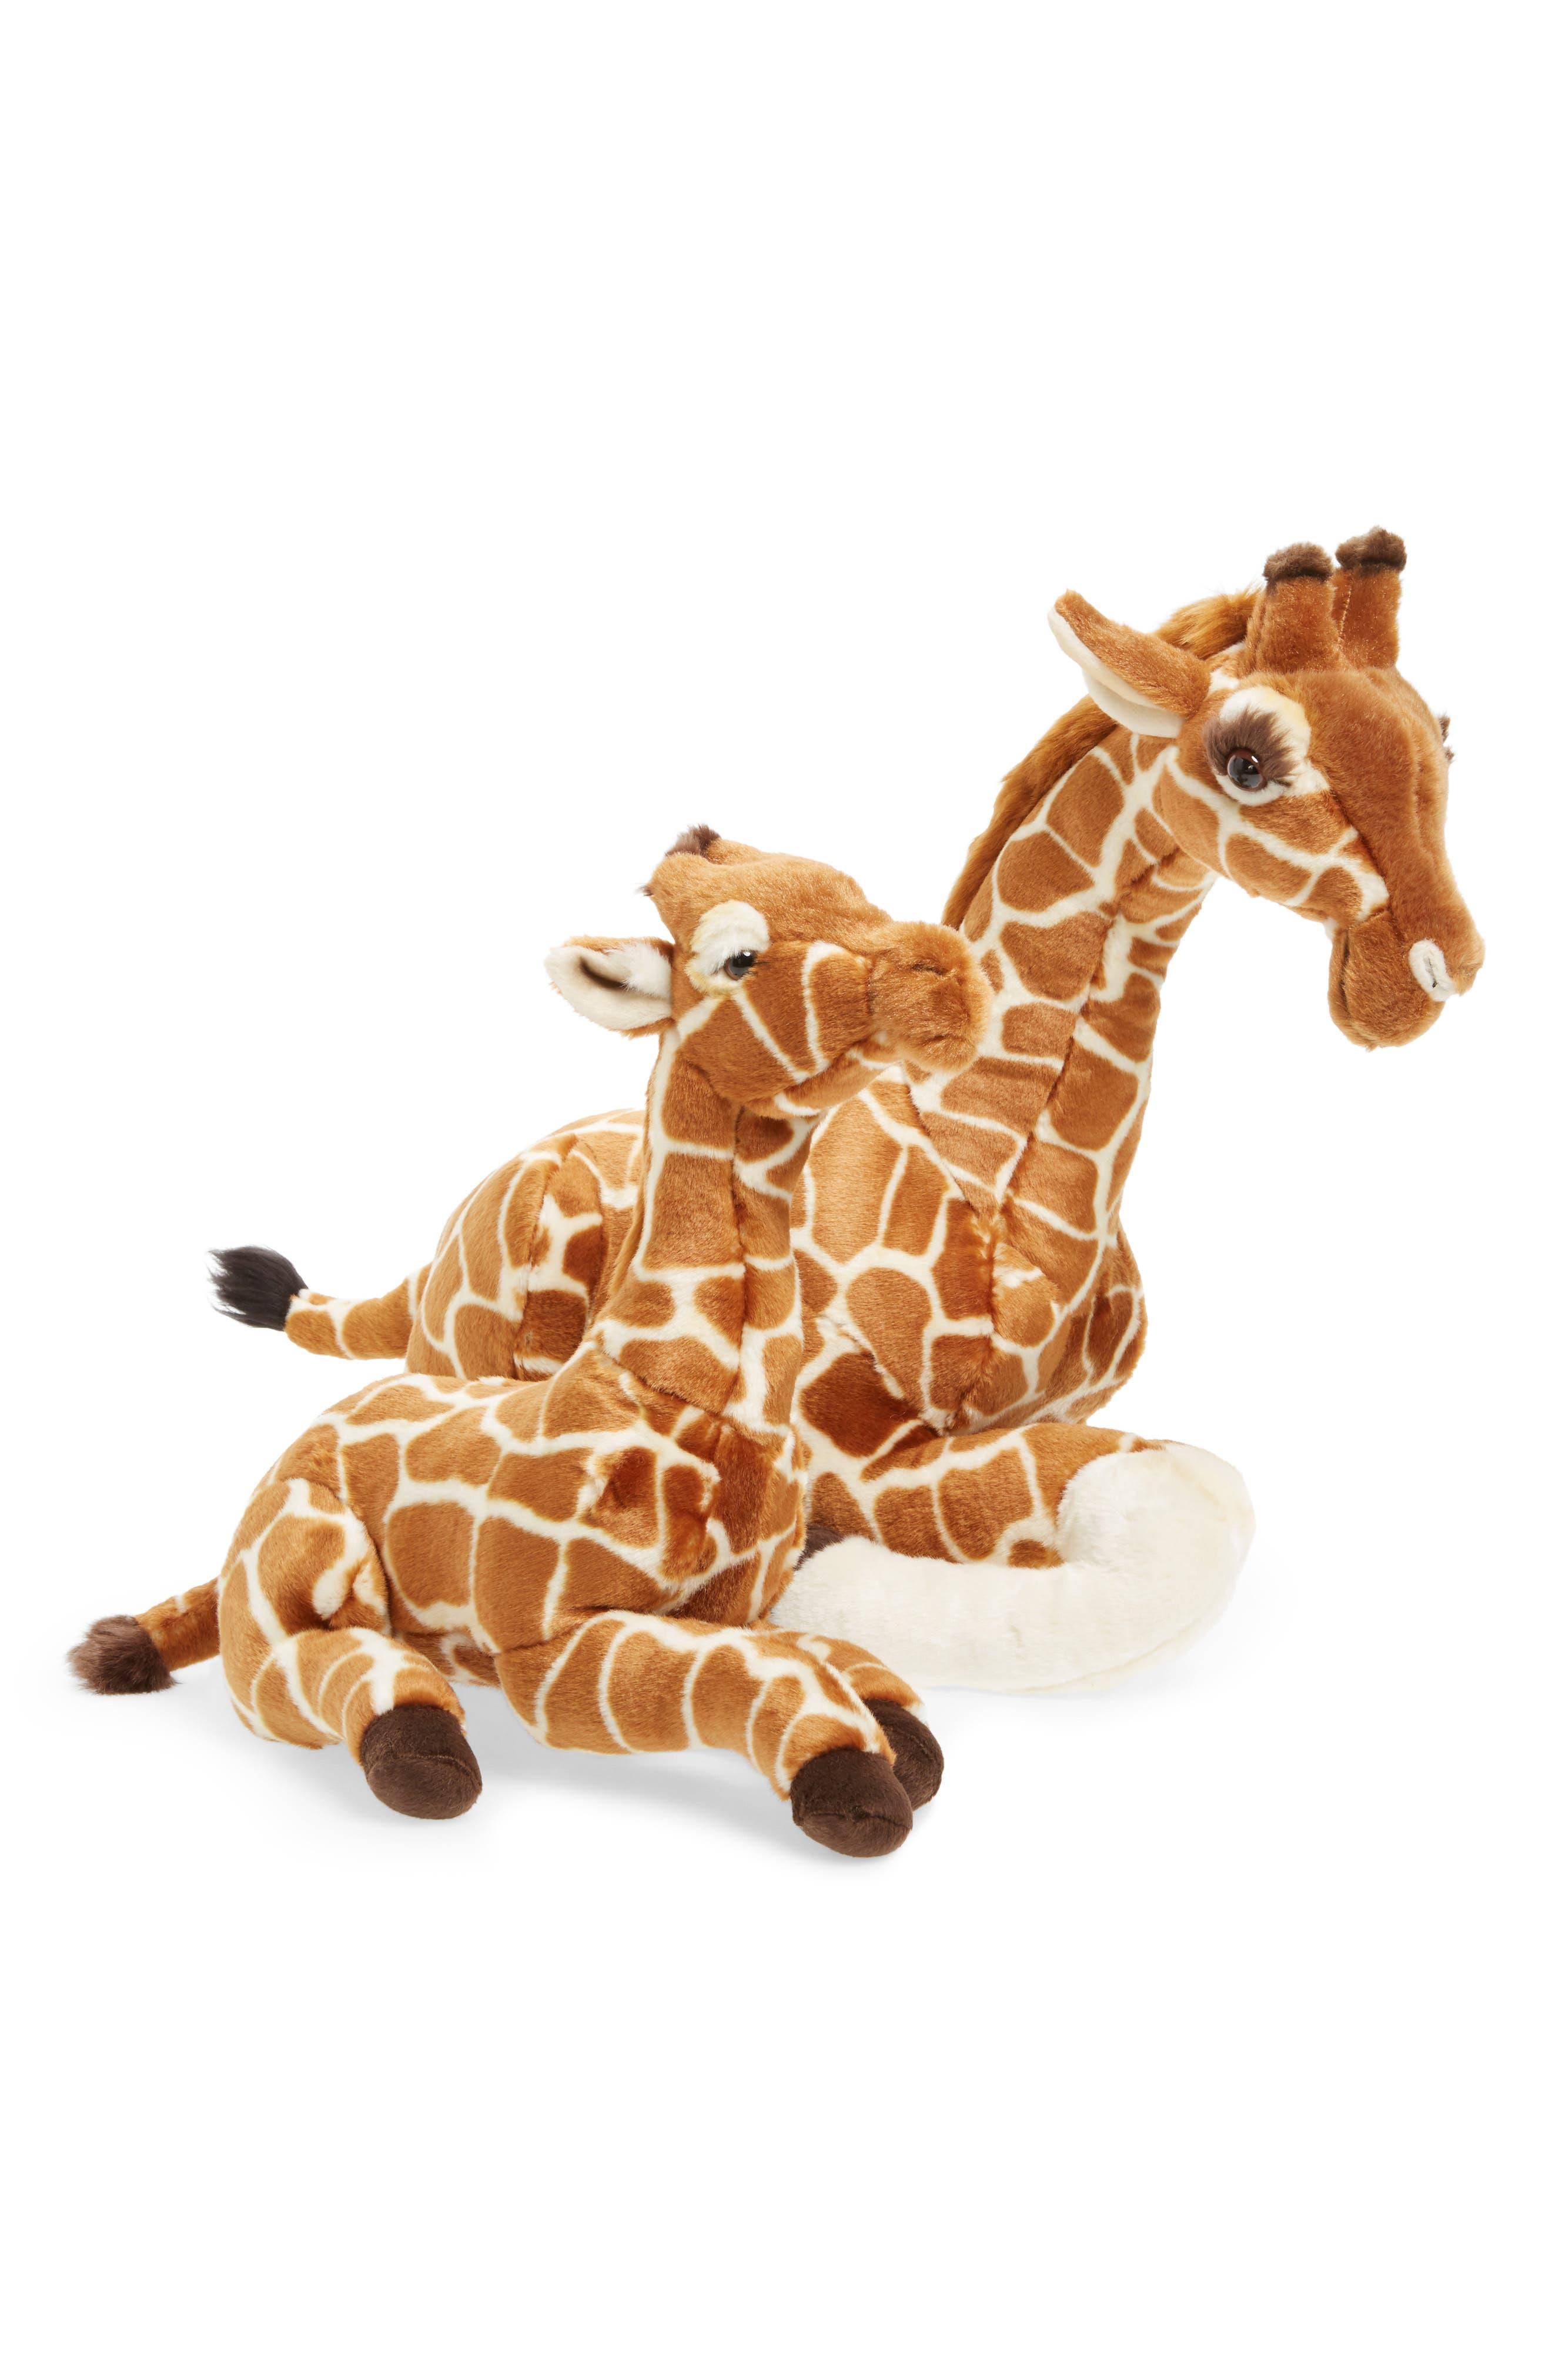 Plush Parent & Baby Giraffe Set,                             Main thumbnail 1, color,                             200